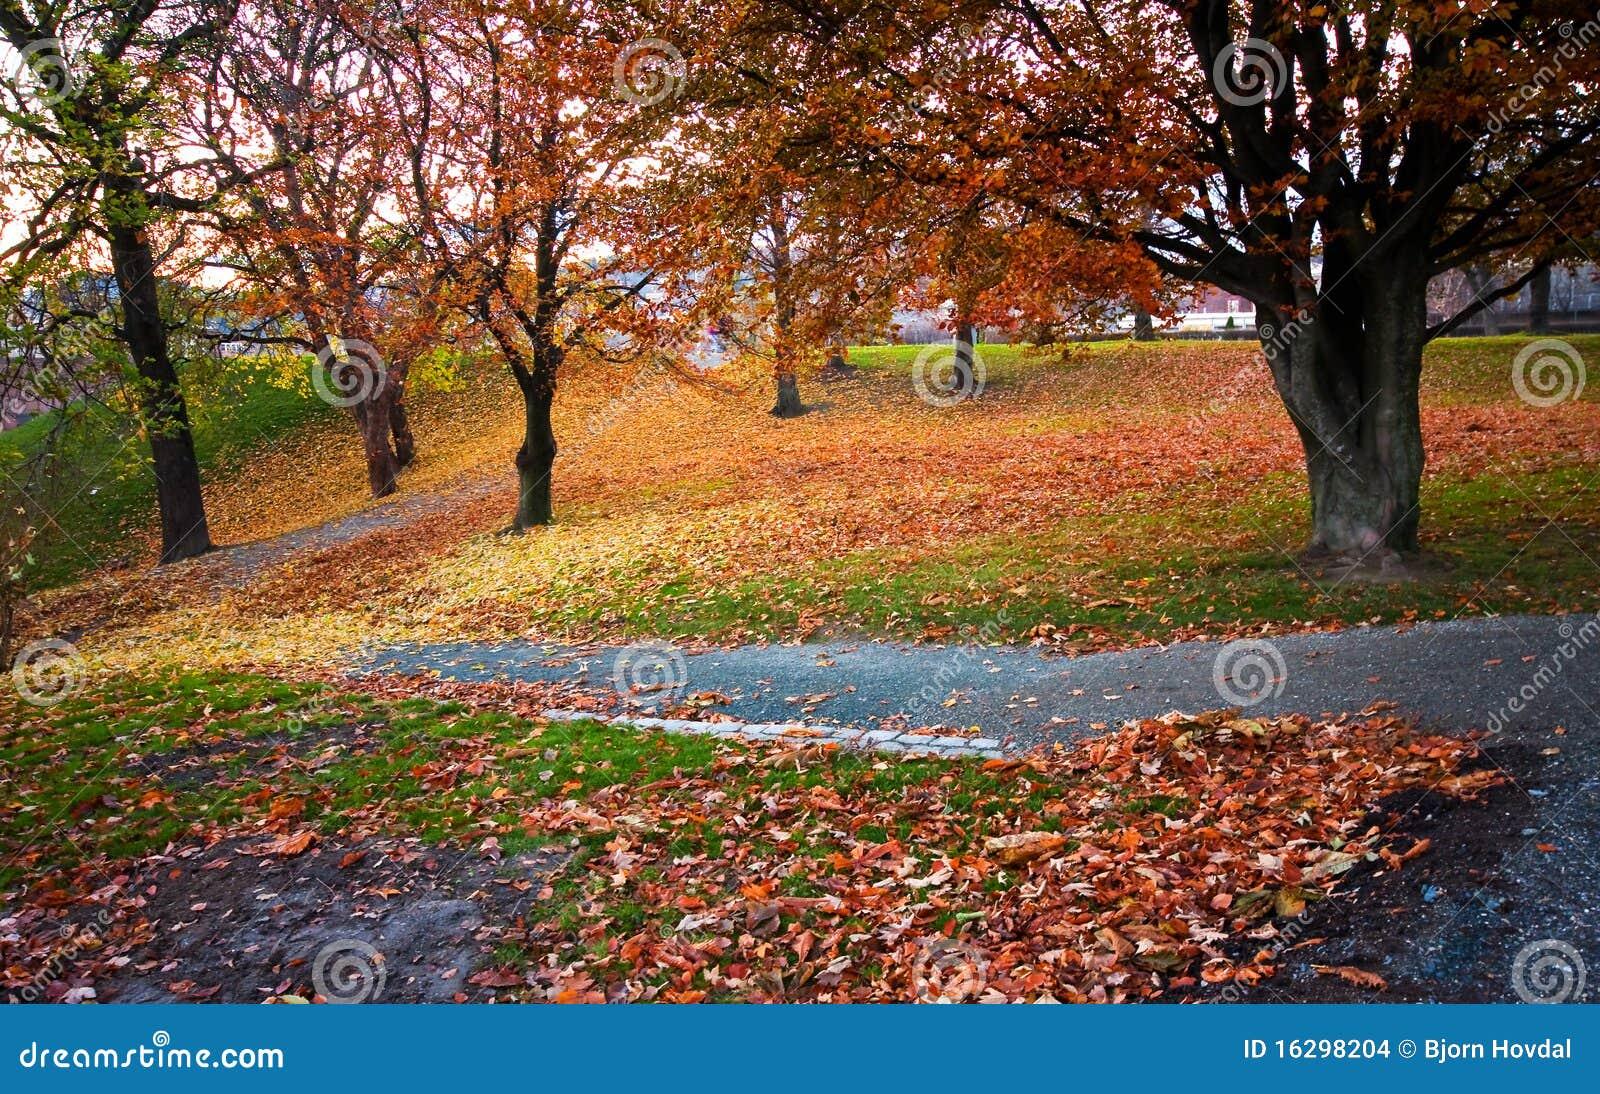 Download Autumn park stock photo. Image of tree, nature, foliage - 16298204